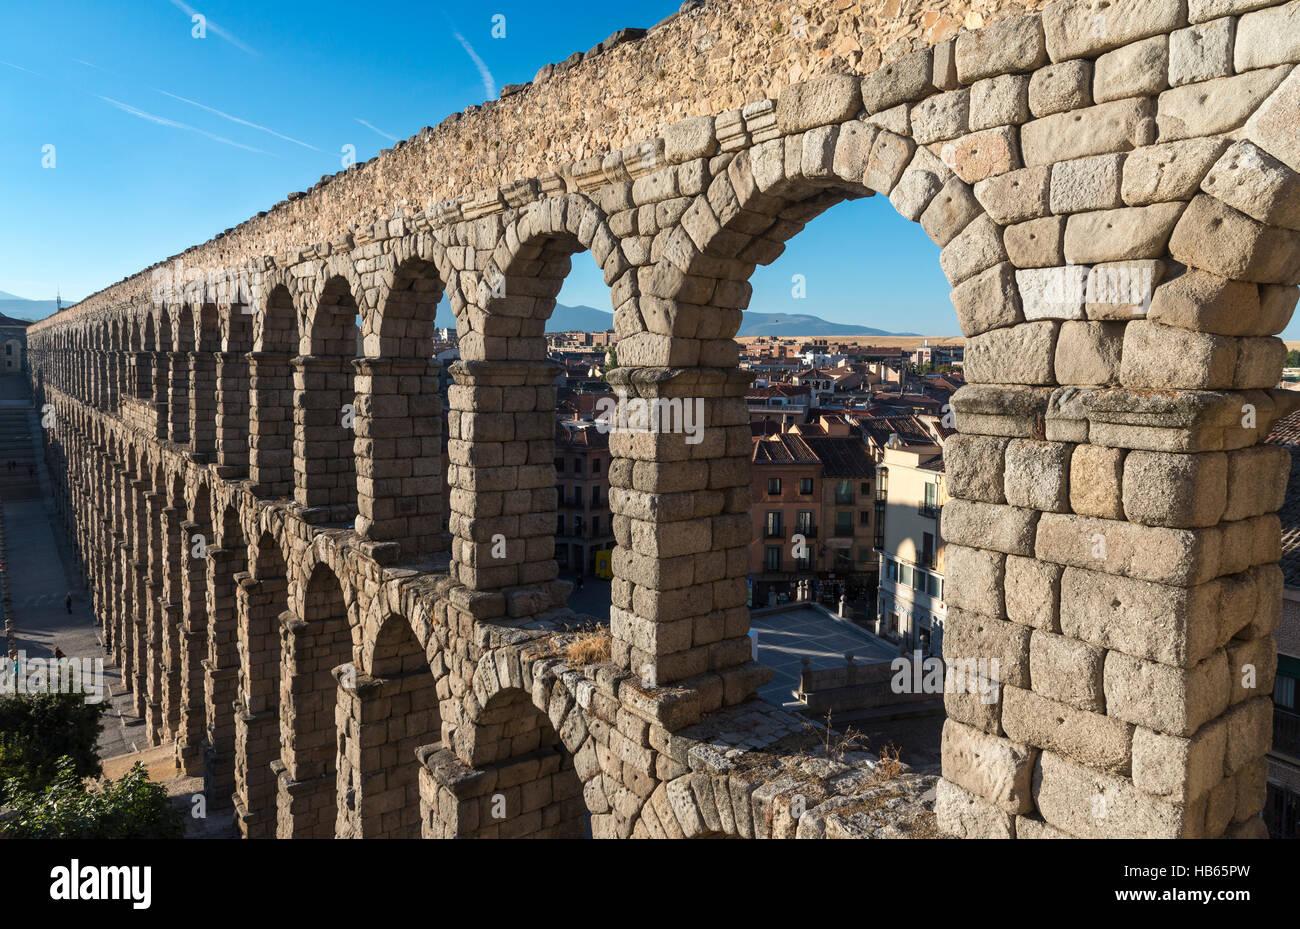 Looking along Segovia's 1st century Roman Aqueduct in the Plaza Azuguejo, Segovia, Spain Stock Photo